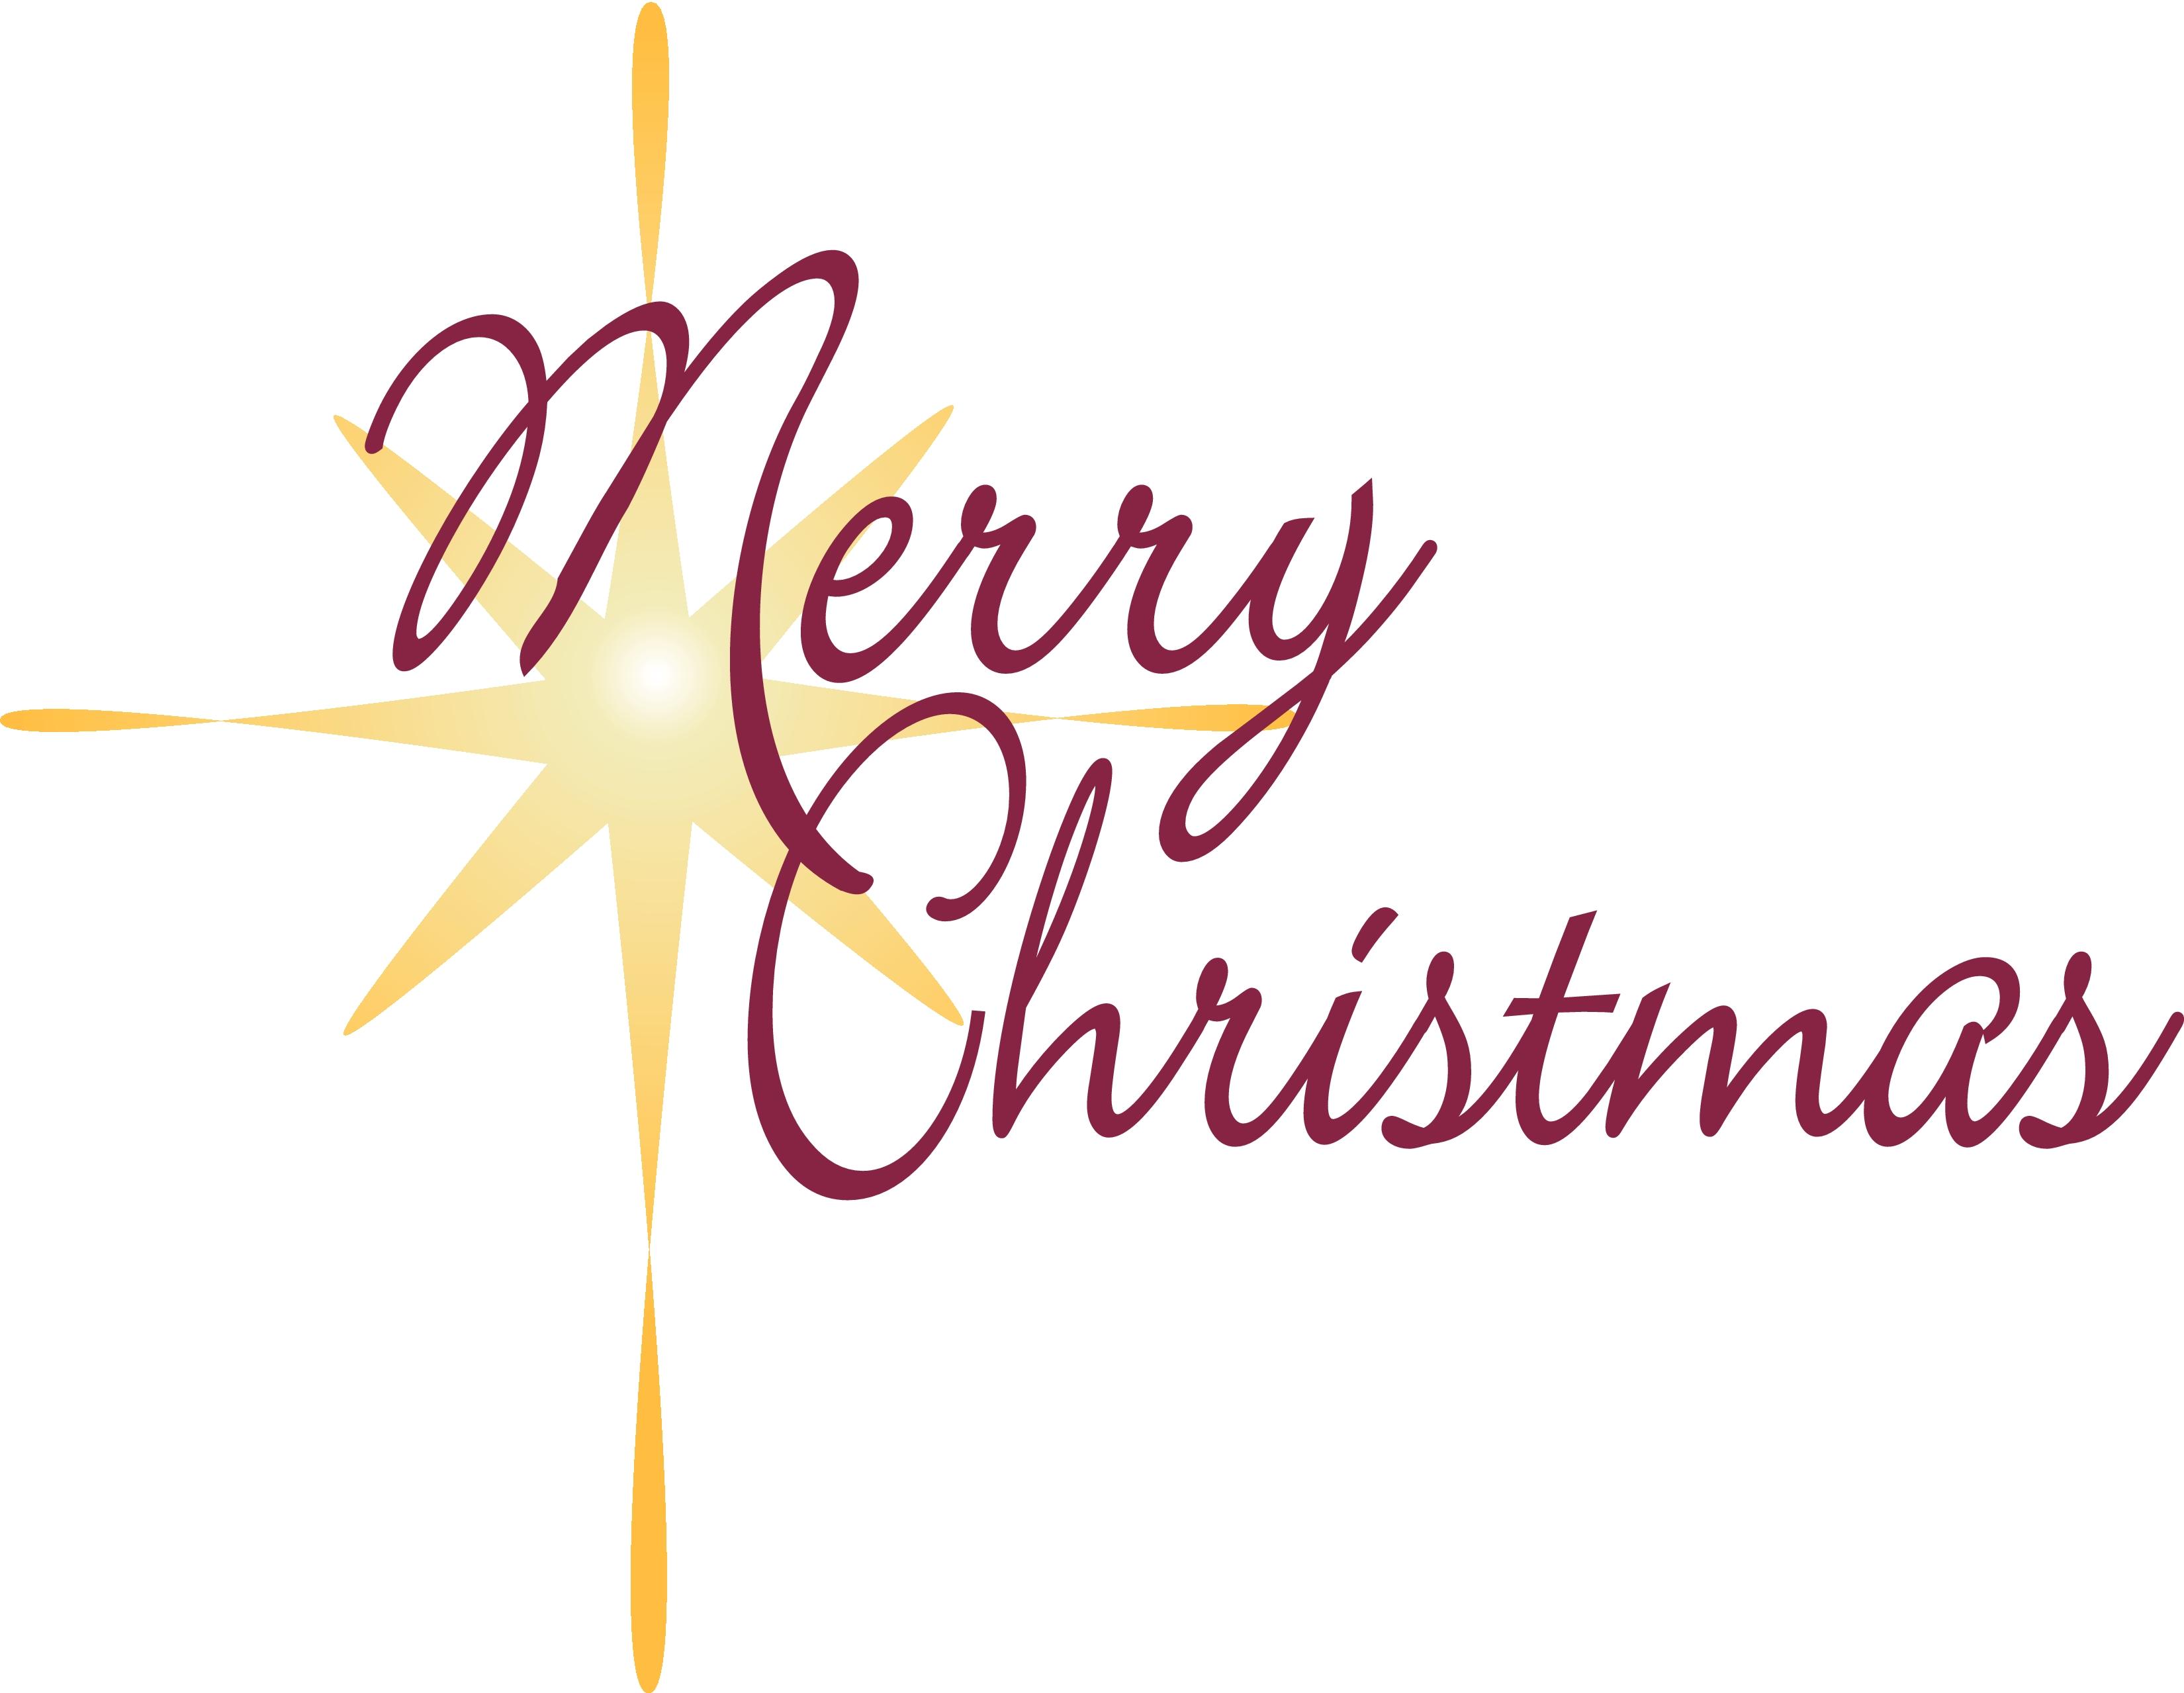 Christian Christmas Word Clip Art free image.